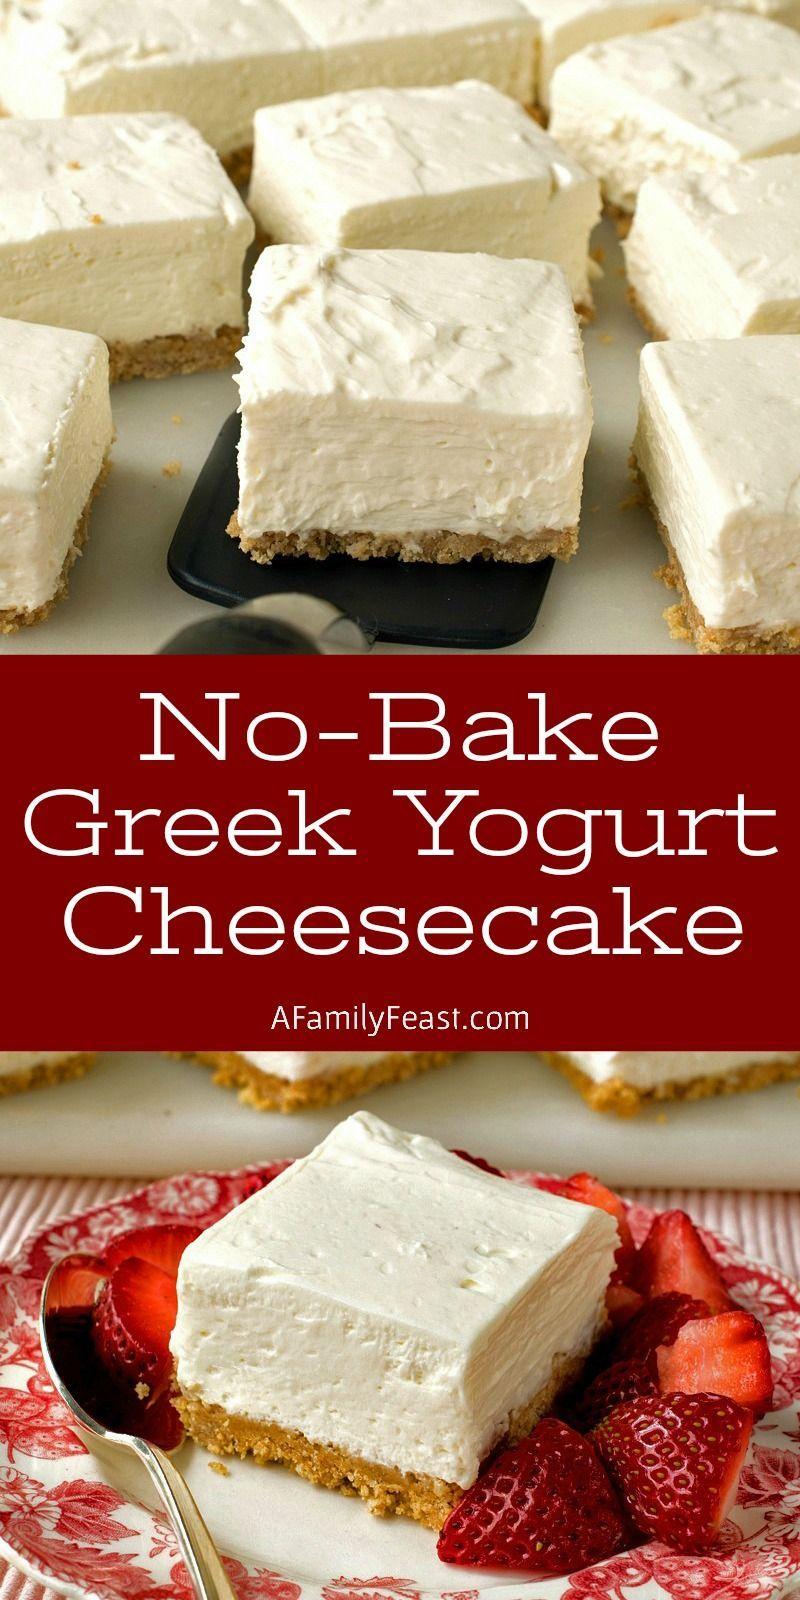 Nobake Greek Yogurt Cheesecake Squares Yogurt Dessert Recipes Greek Yogurt Recipes Healthy Cheesecake